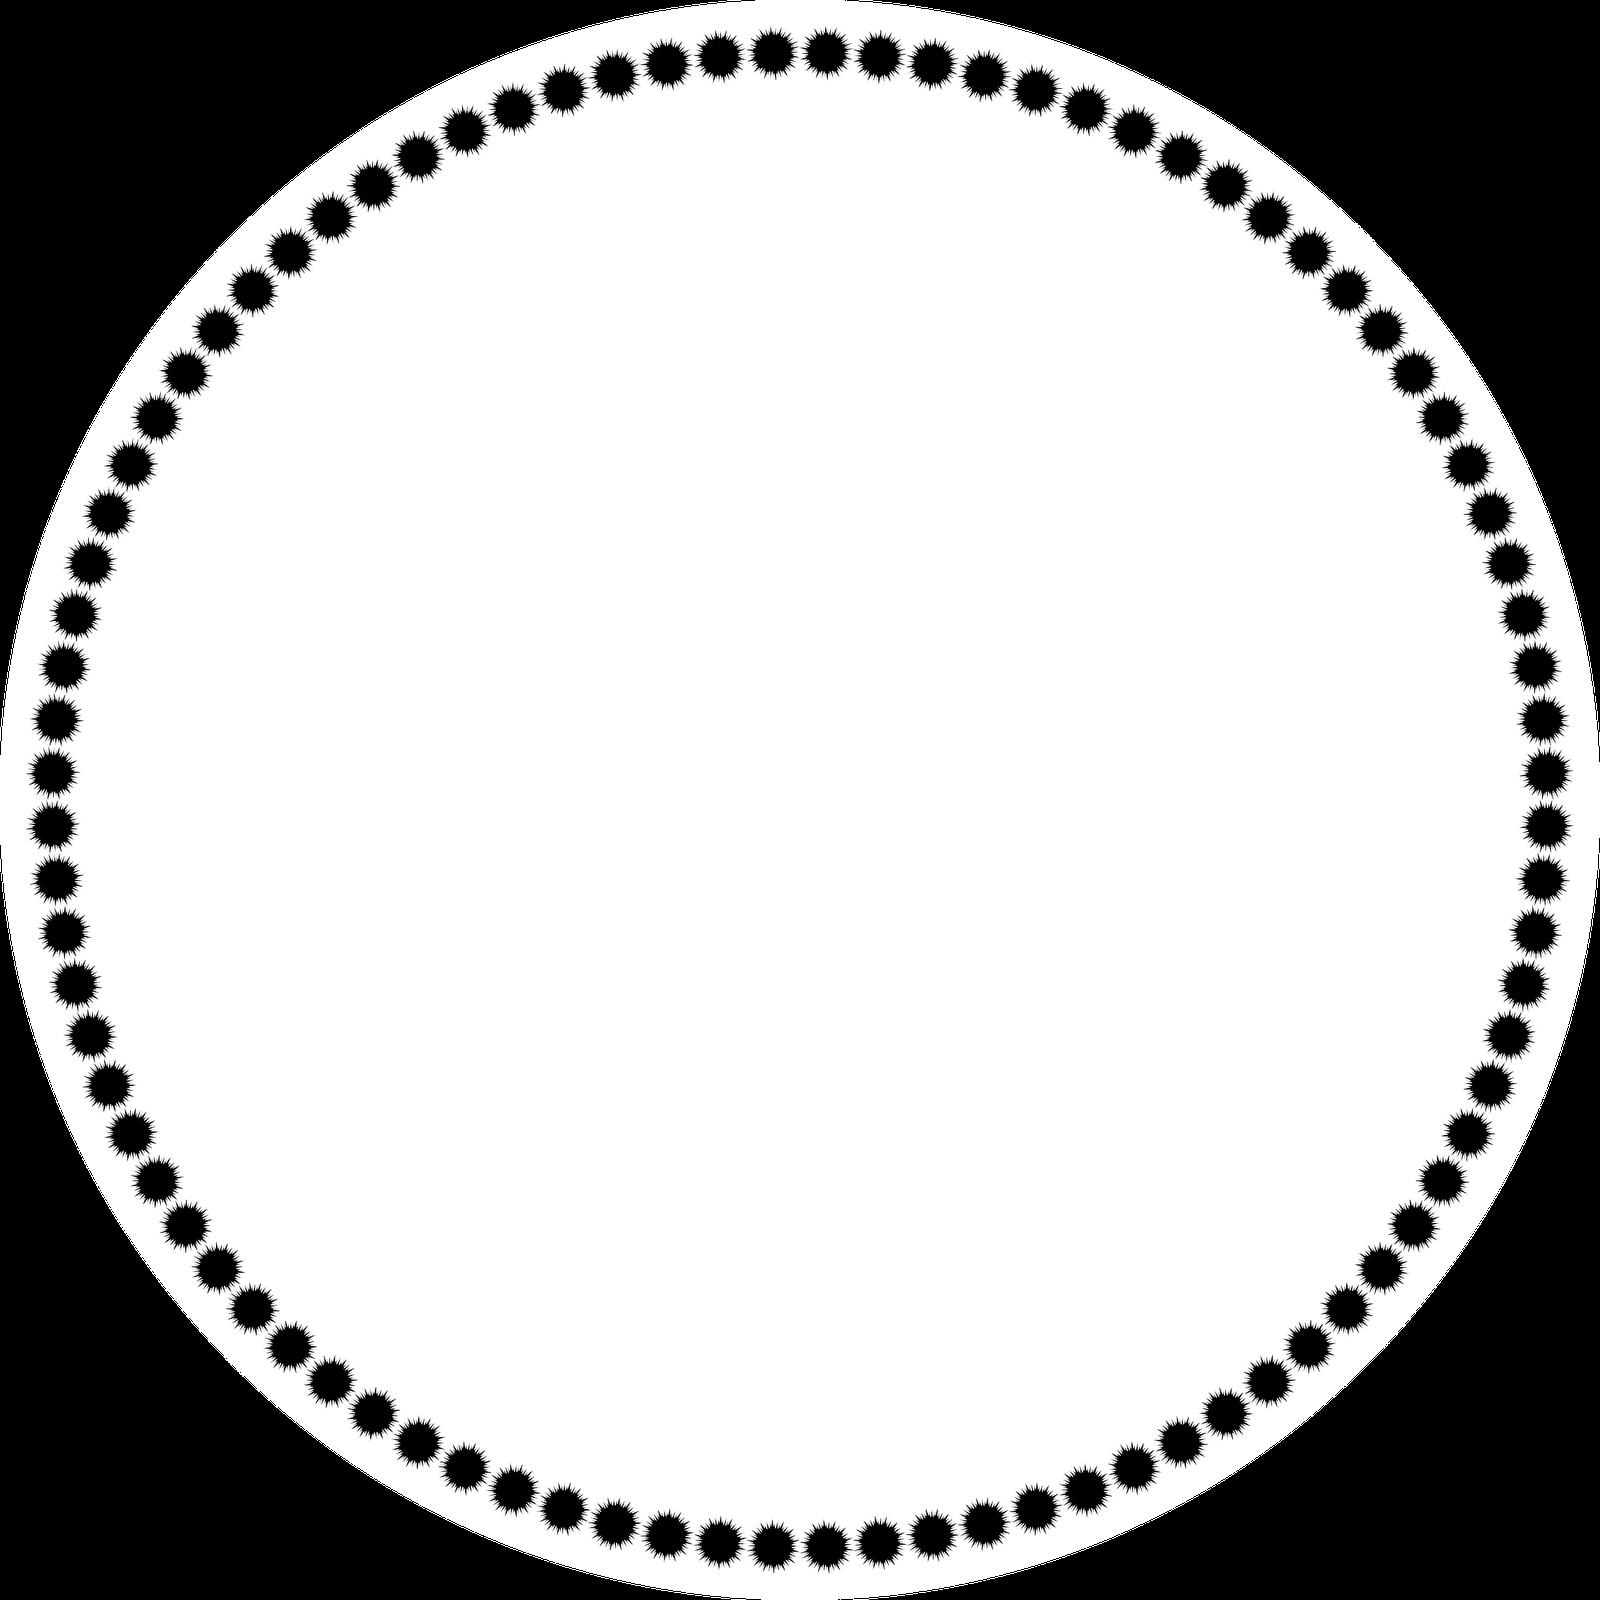 Free Circle Border Cliparts, Download Free Clip Art, Free Clip Art.